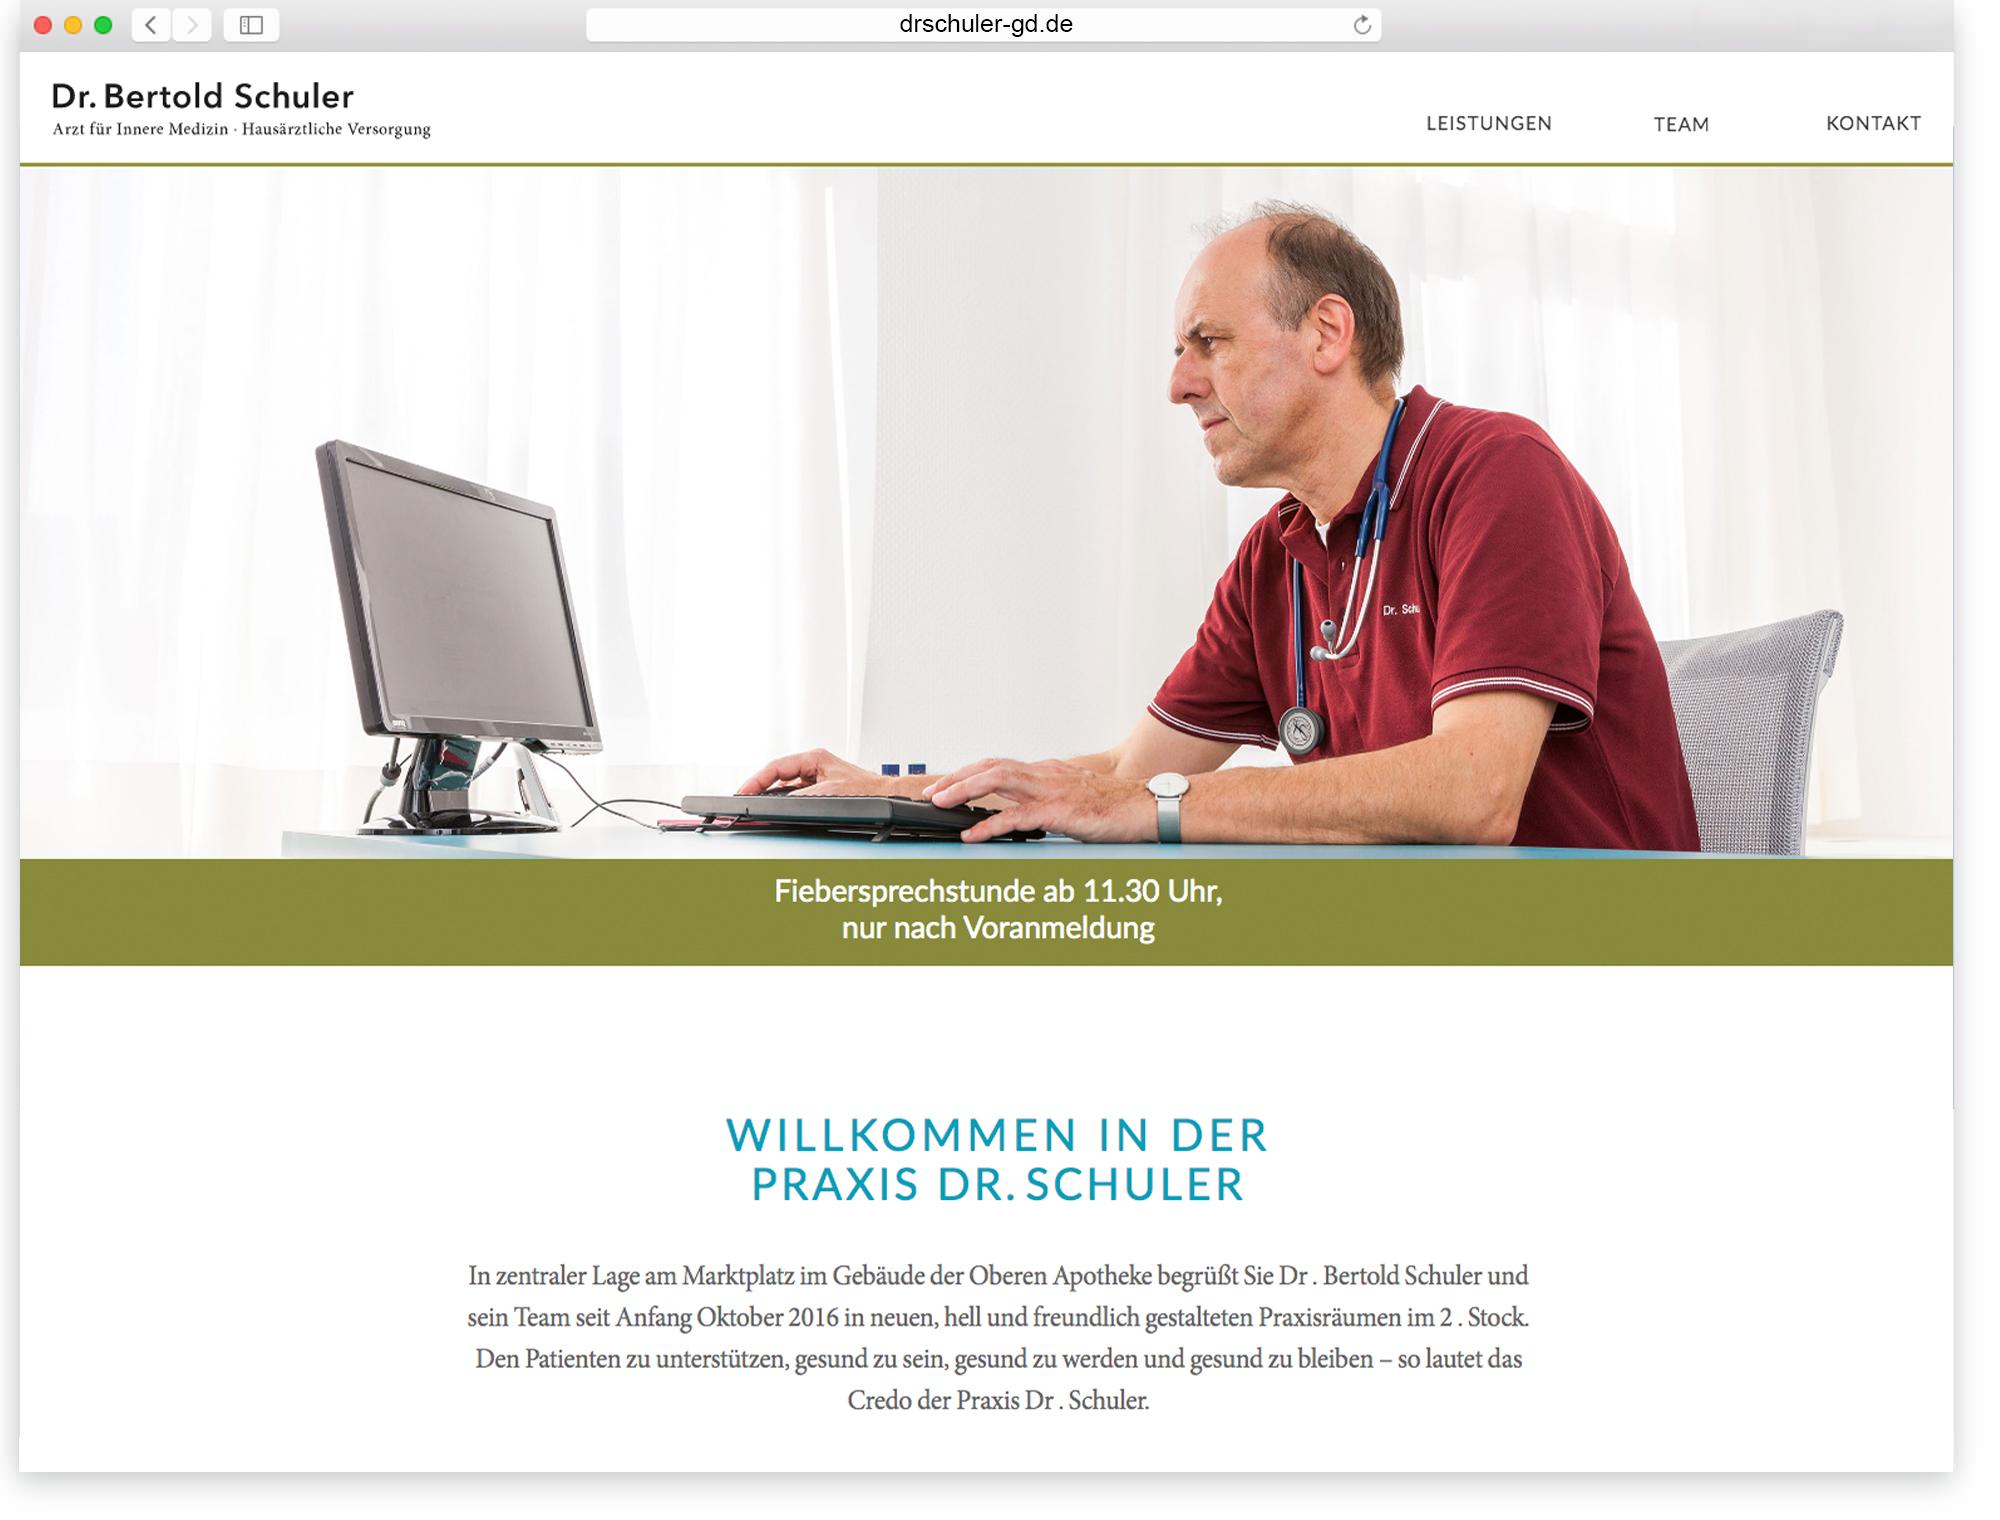 fh-web-drschuler.jpg